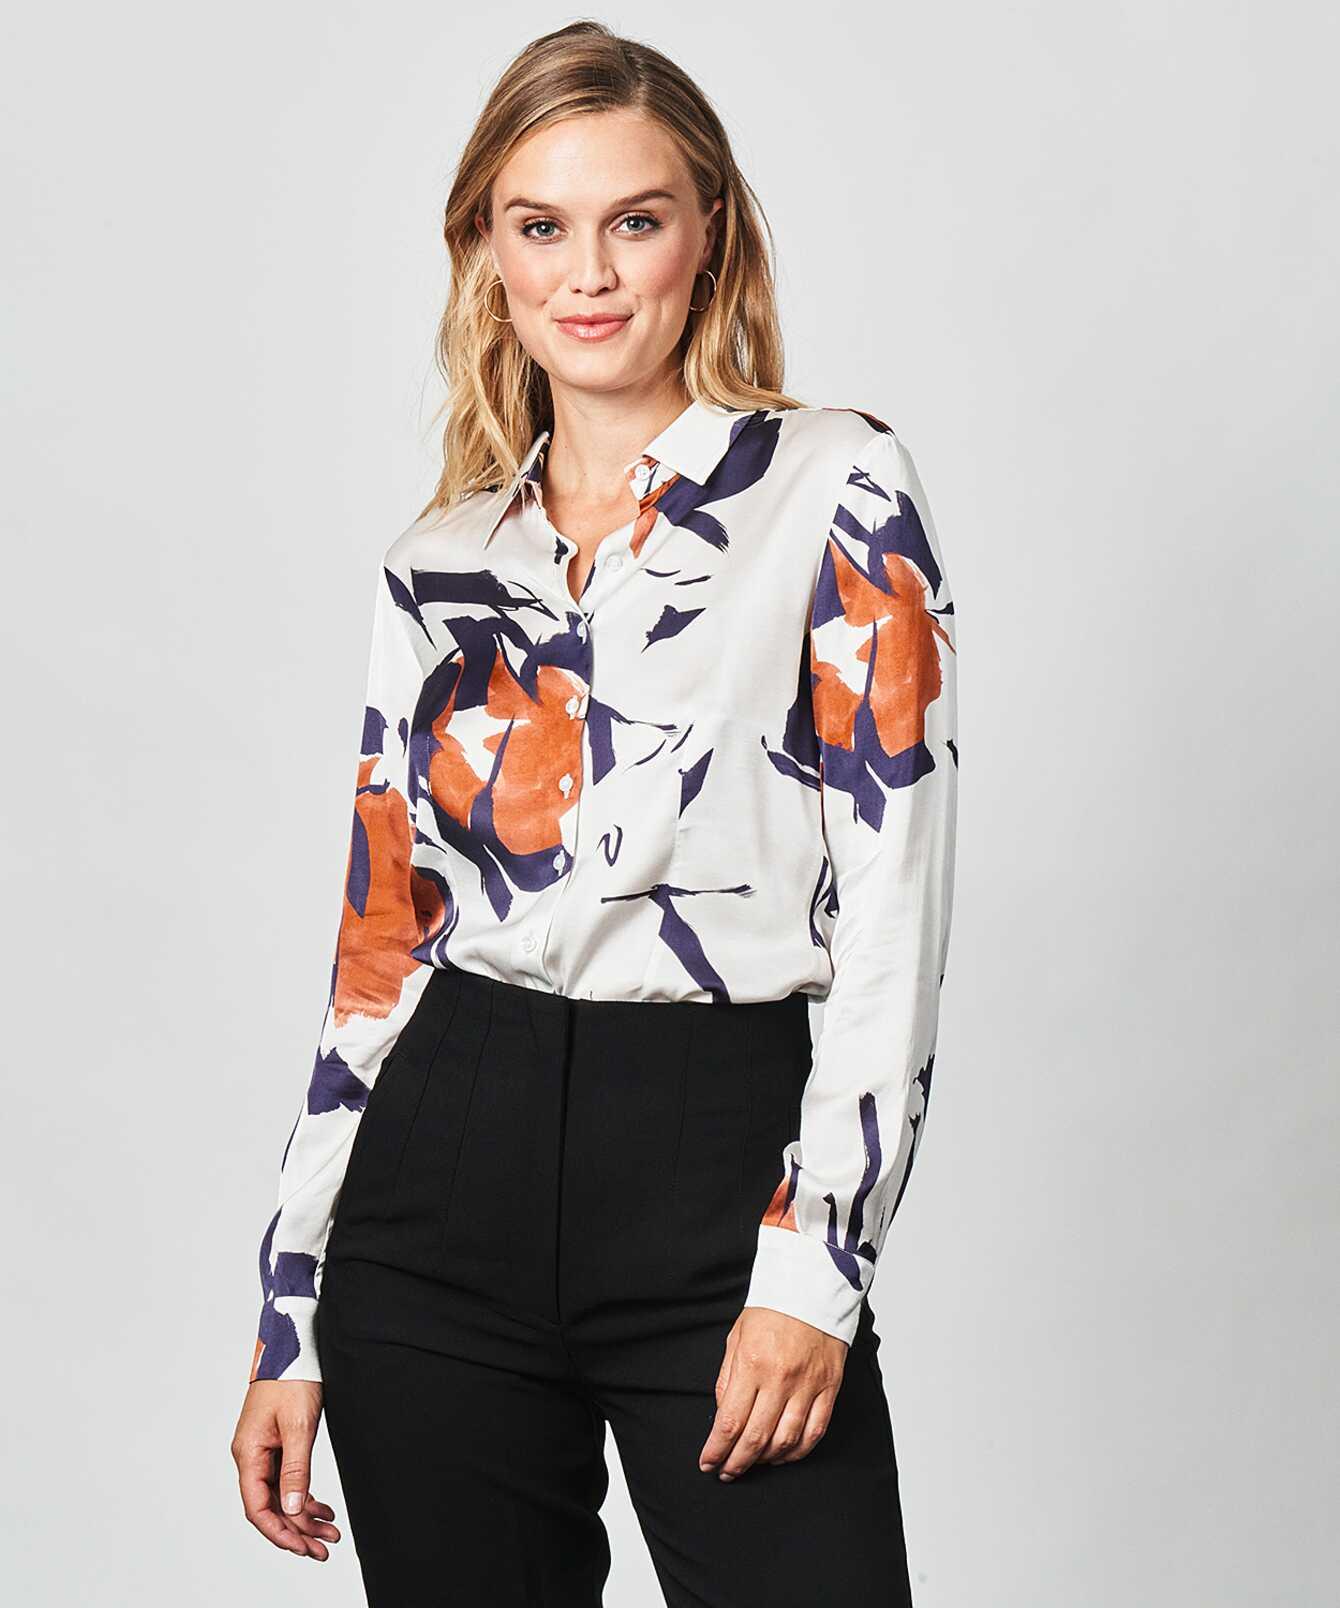 Skjorta Tilde Admiration The Shirt Factory